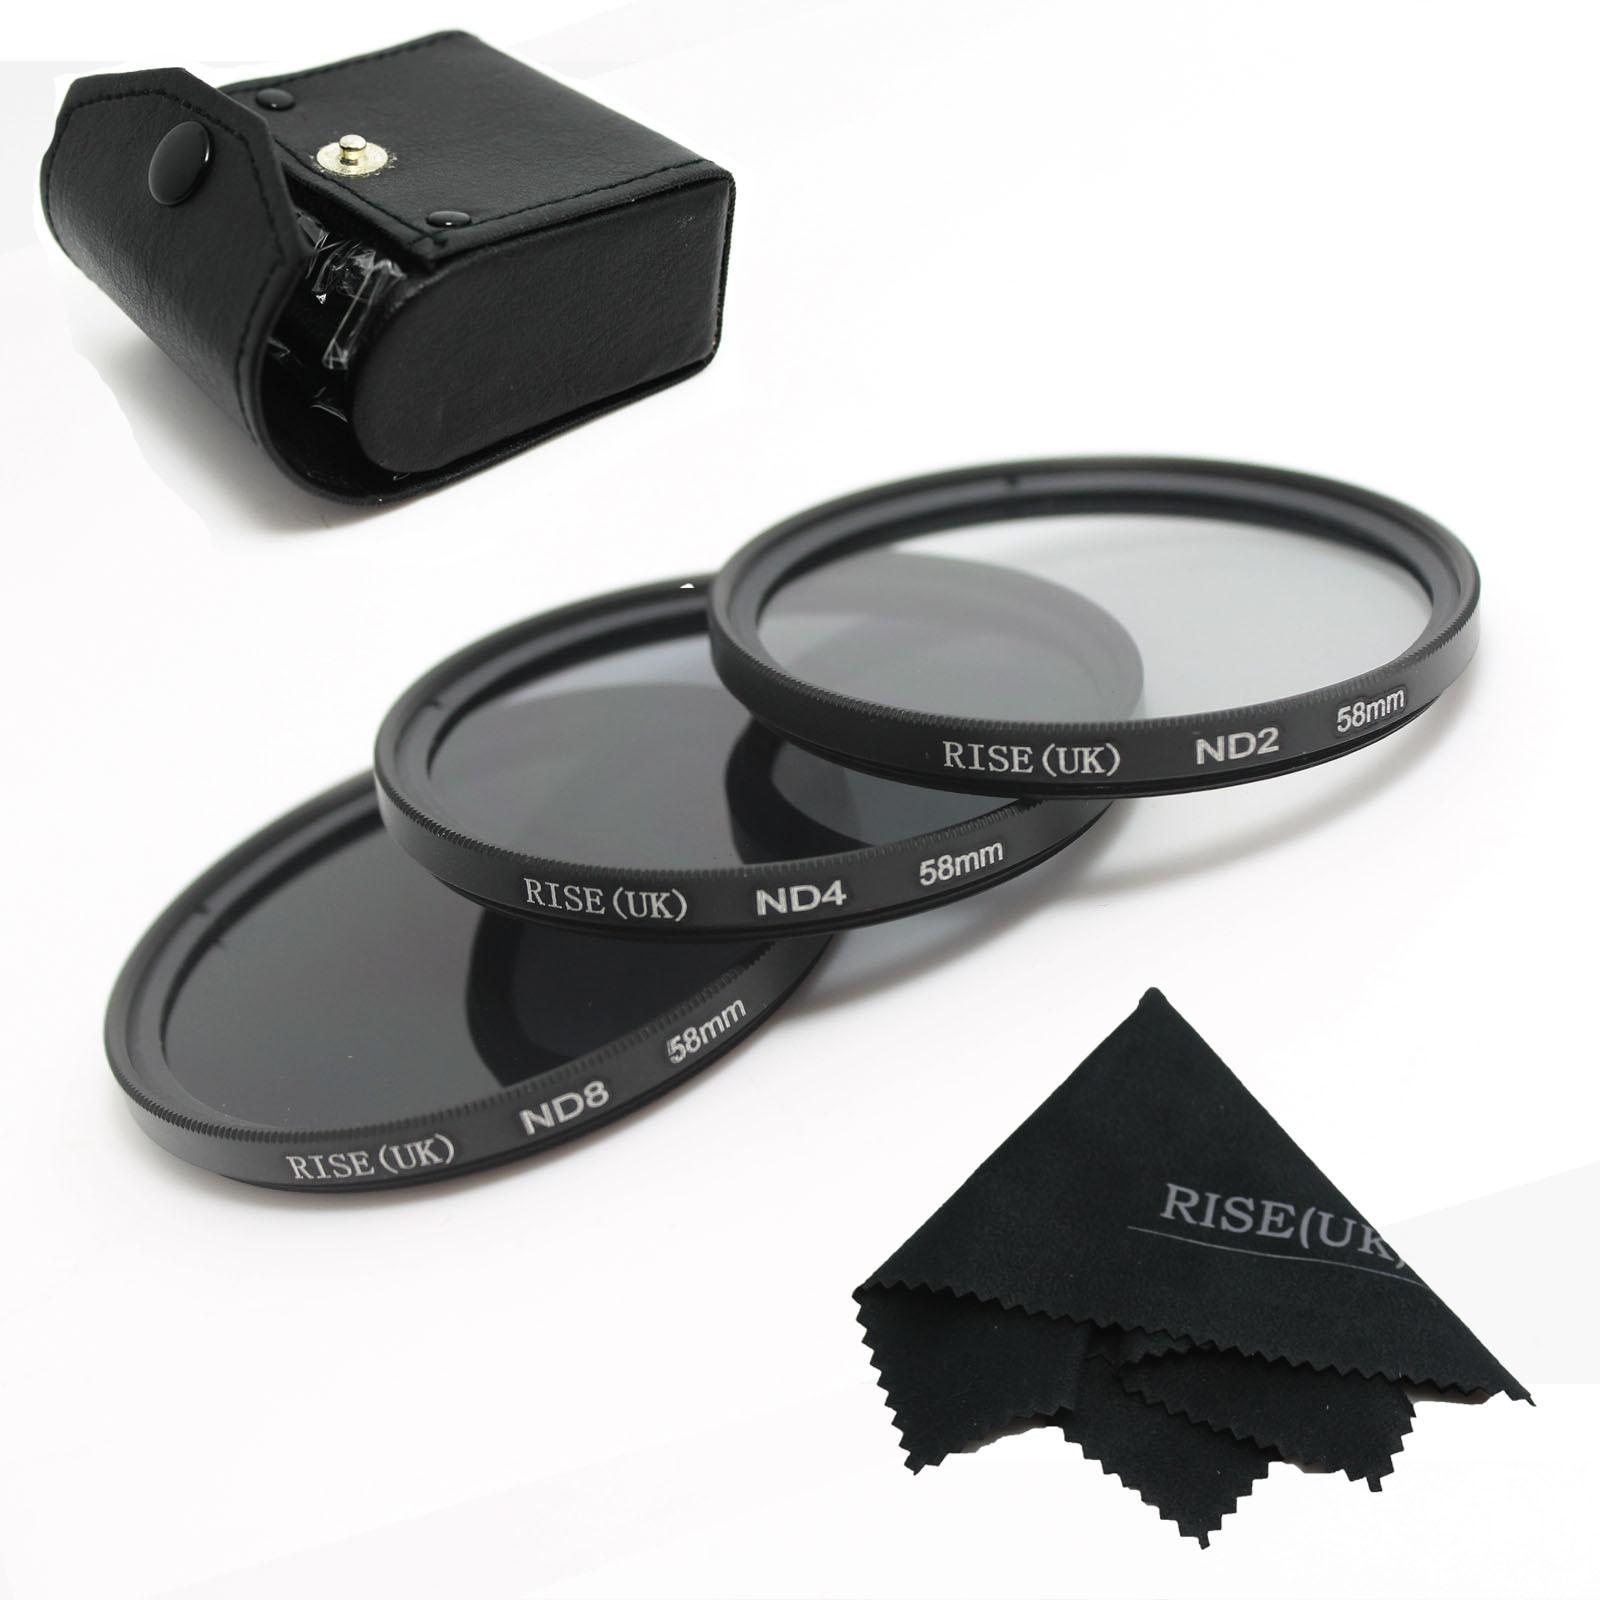 100% GARANTIE Neue 58mm Neutral Density ND2 ND4 ND8 ND 2 + 4 + 8 Filter Set mit fall 58mm Kit Für kamera Dslr-objektiv